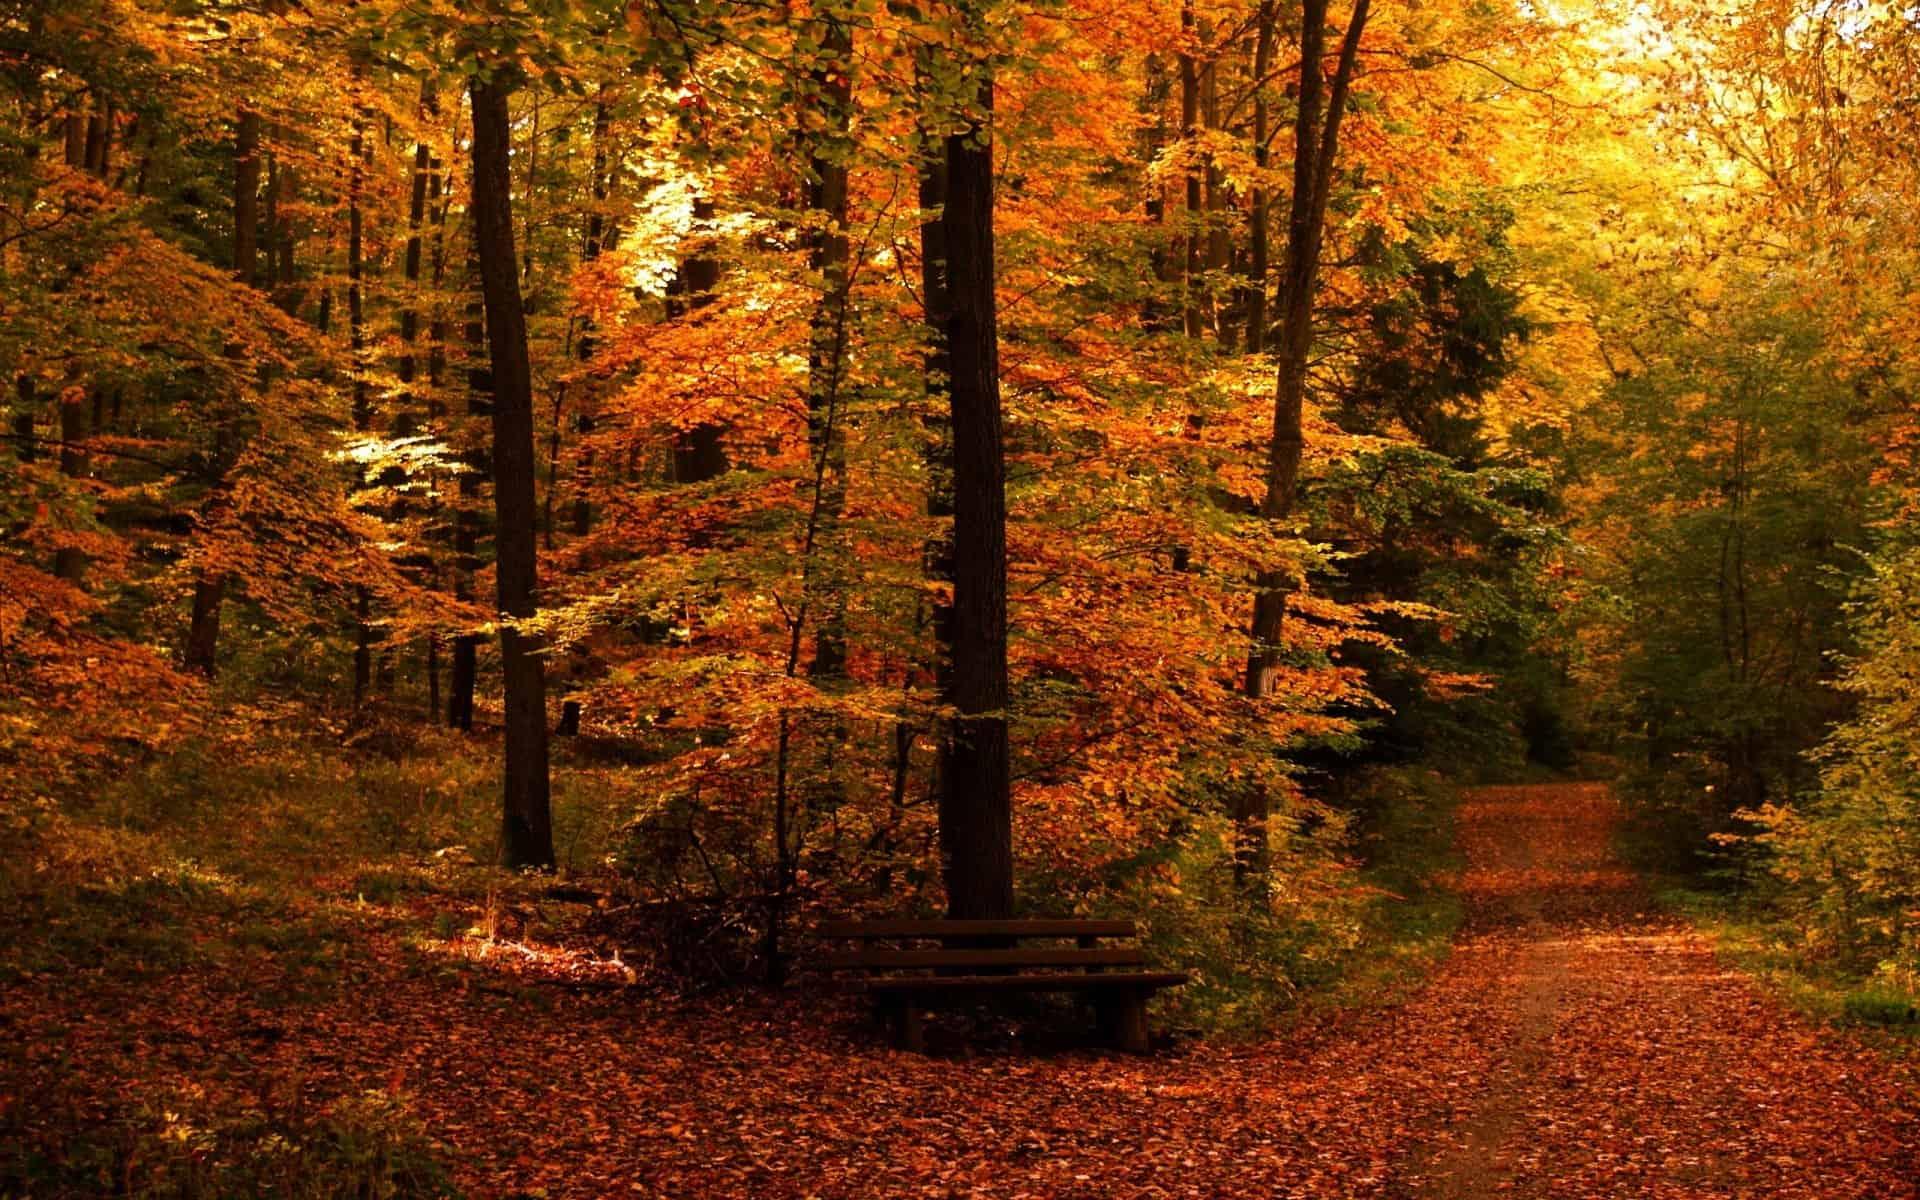 Autumn Wallpaper 037